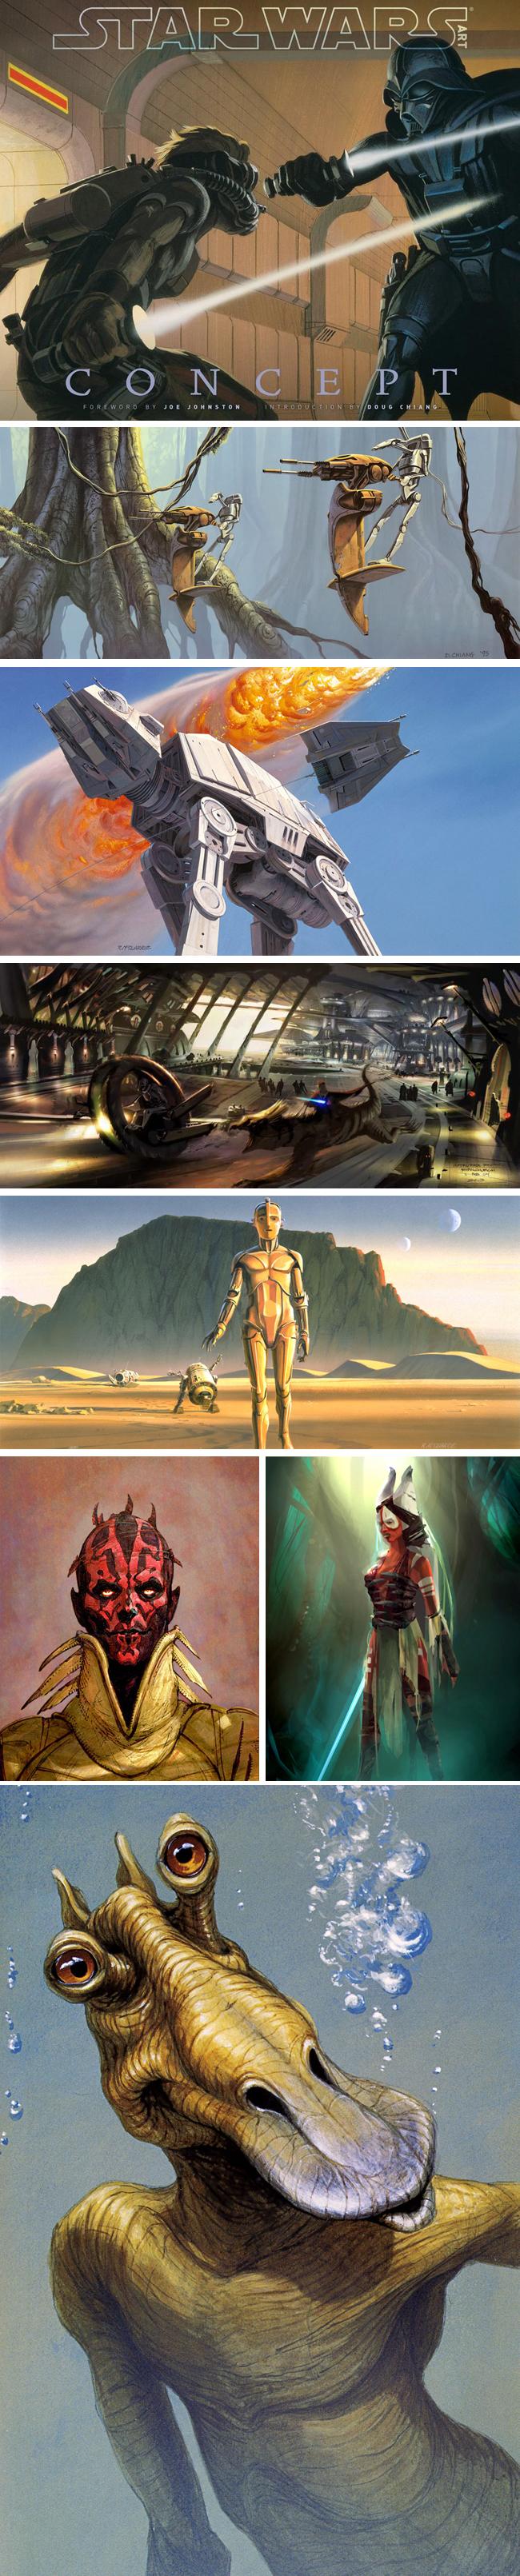 concept-art-star-wars-madrid-academiac10-disney-lucas-cine-animacion